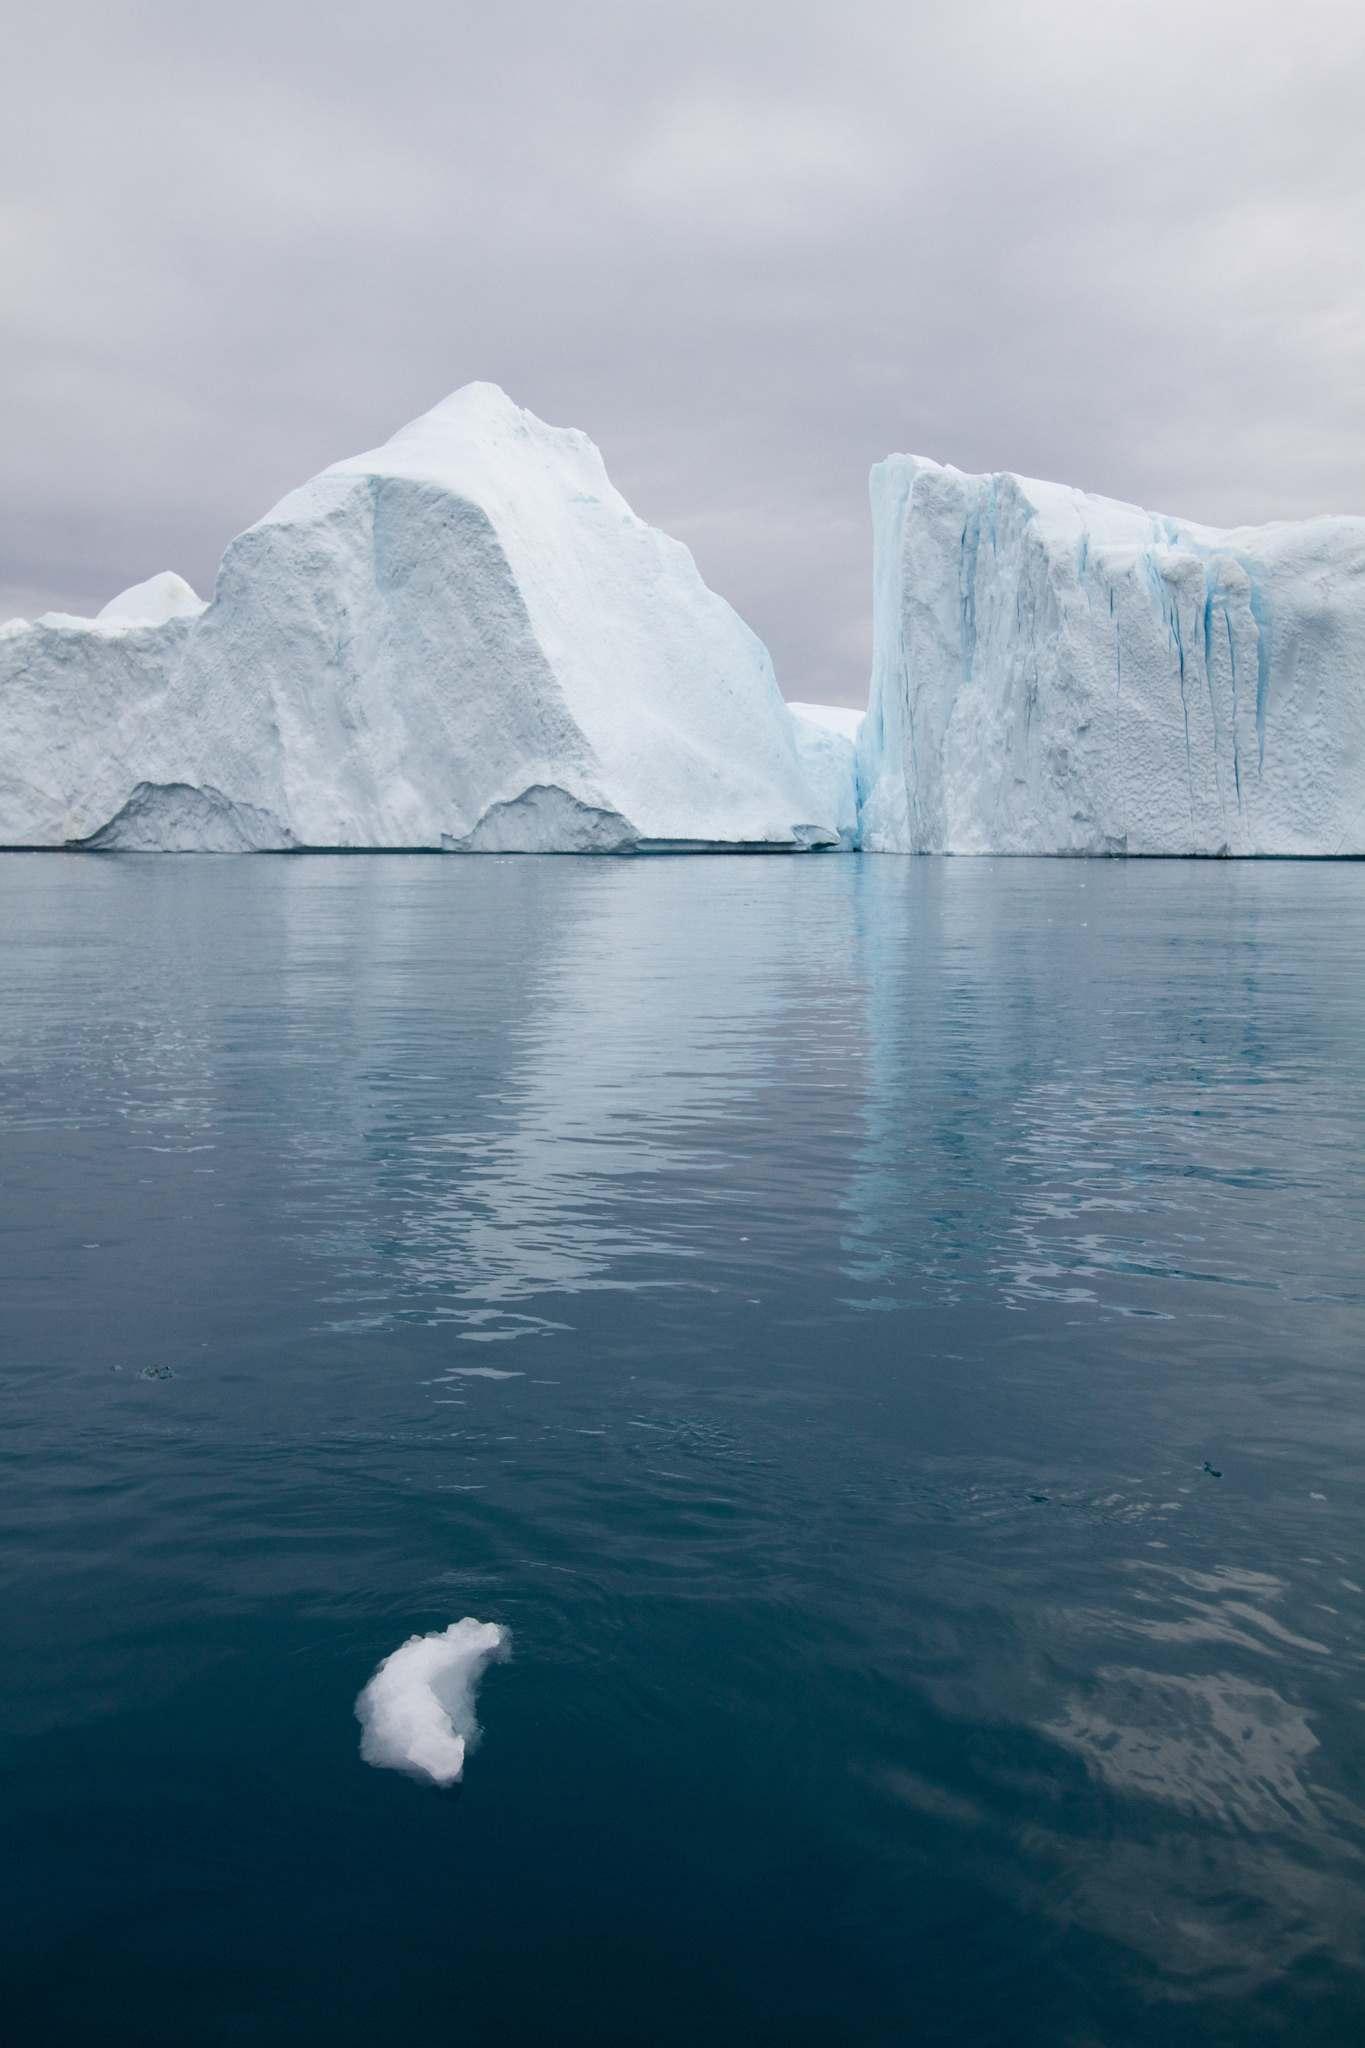 icefjord ilulissat5 The icefjord in Ilulissat, Greenland